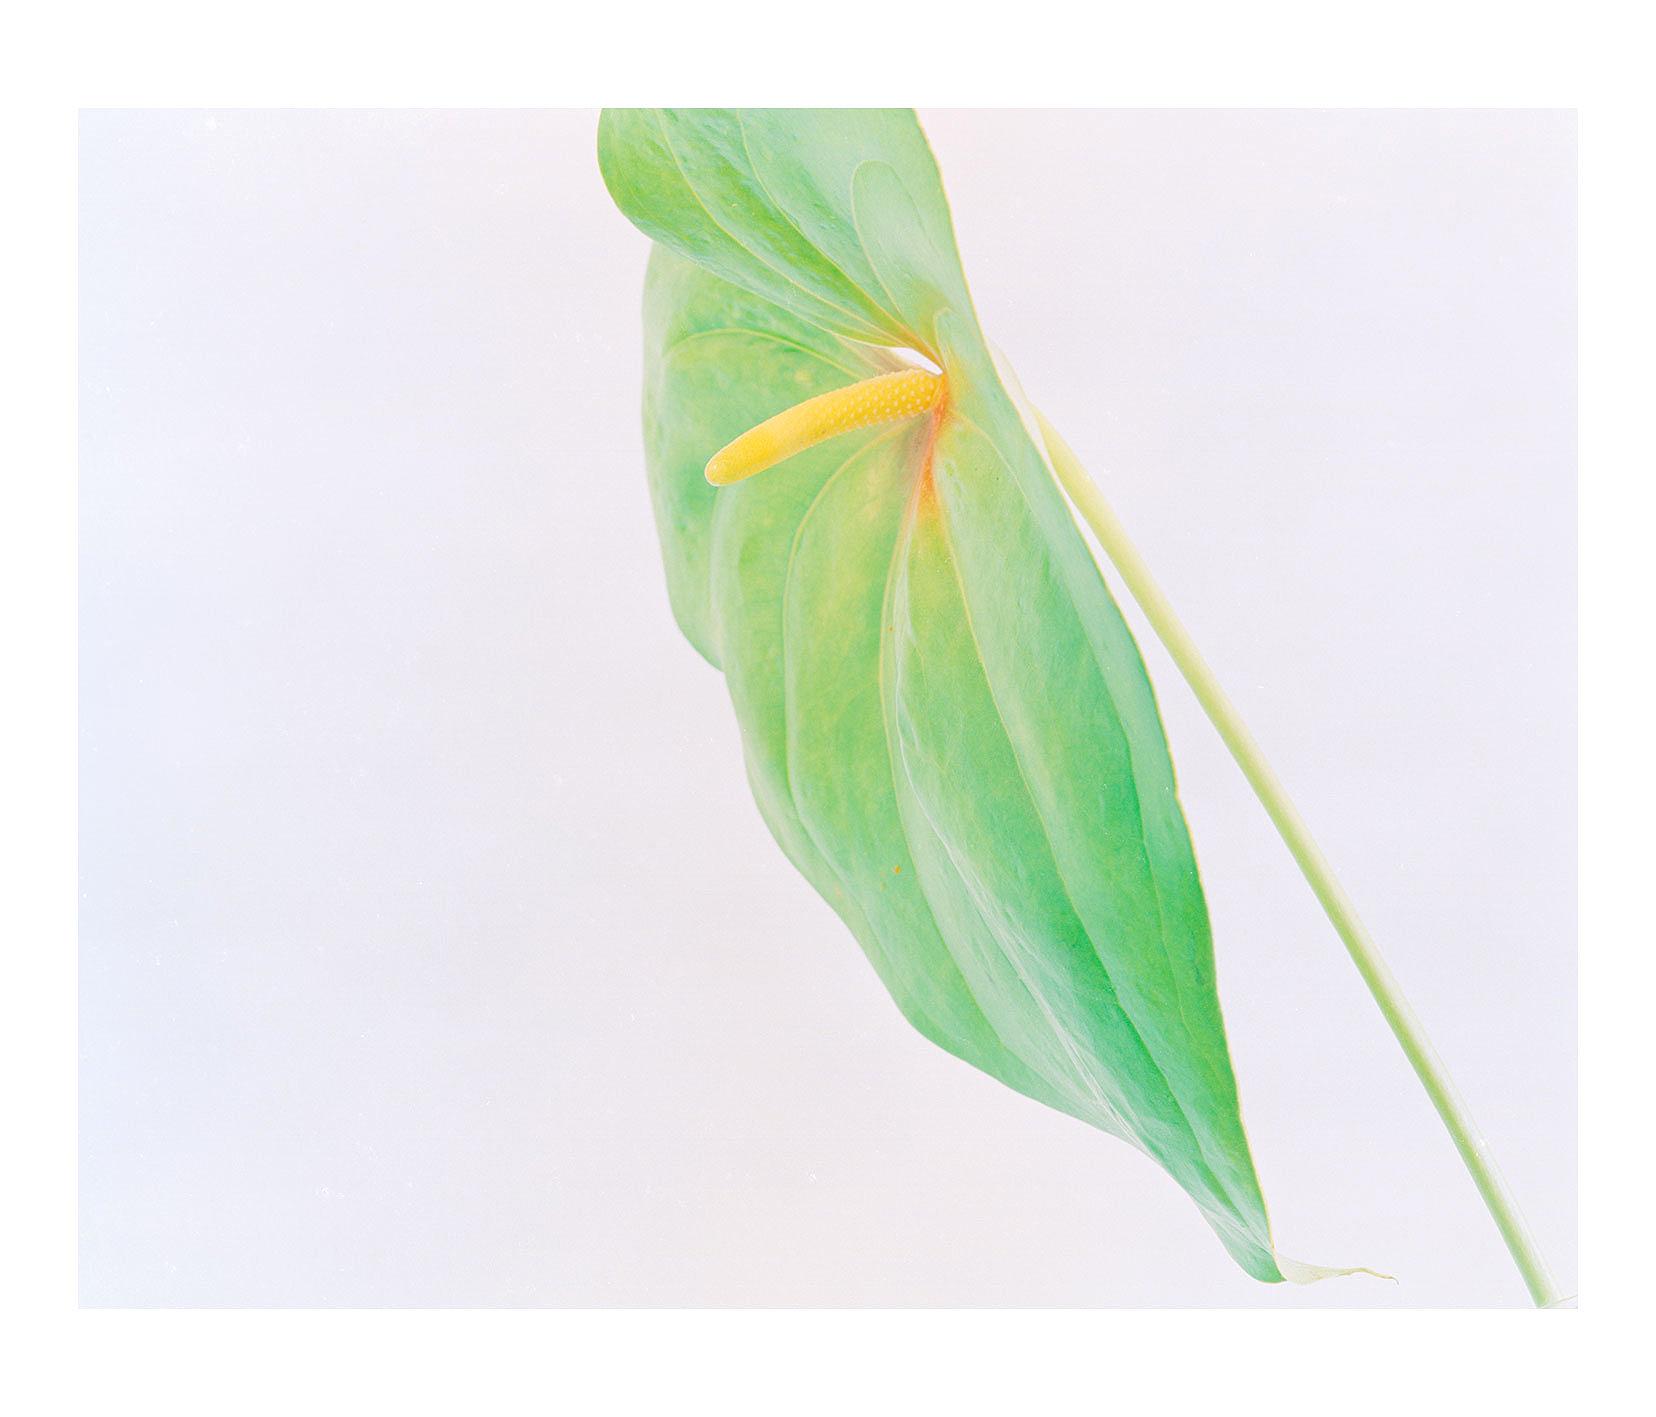 georgia-kokolis-flower--8-copy.jpg